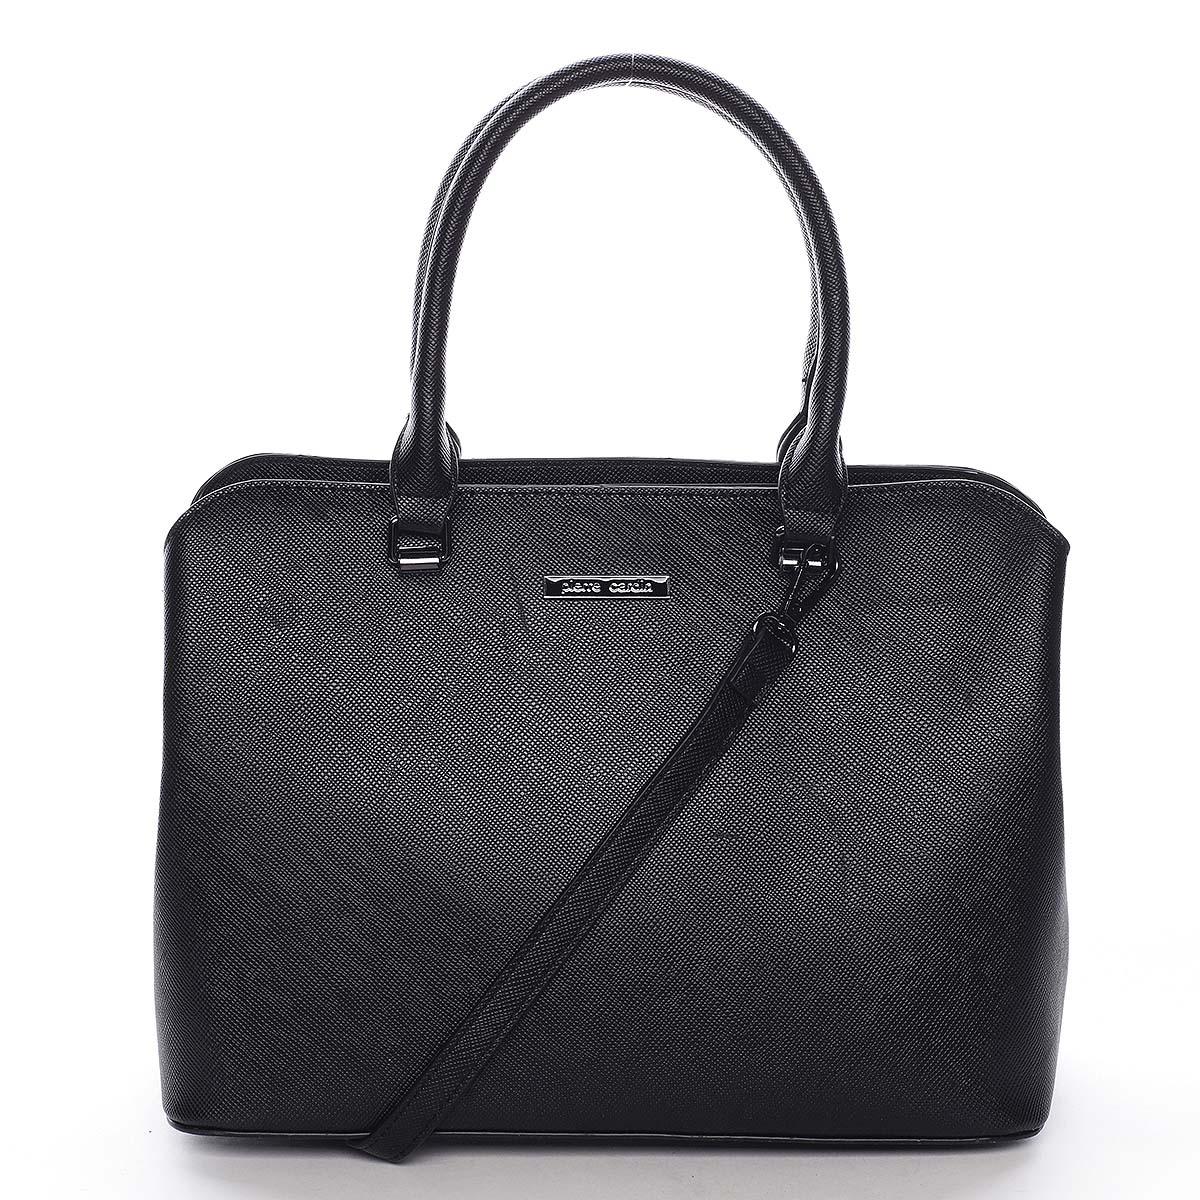 Dámska kabelka do ruky čierna - Pierre Cardin Melodi čierna